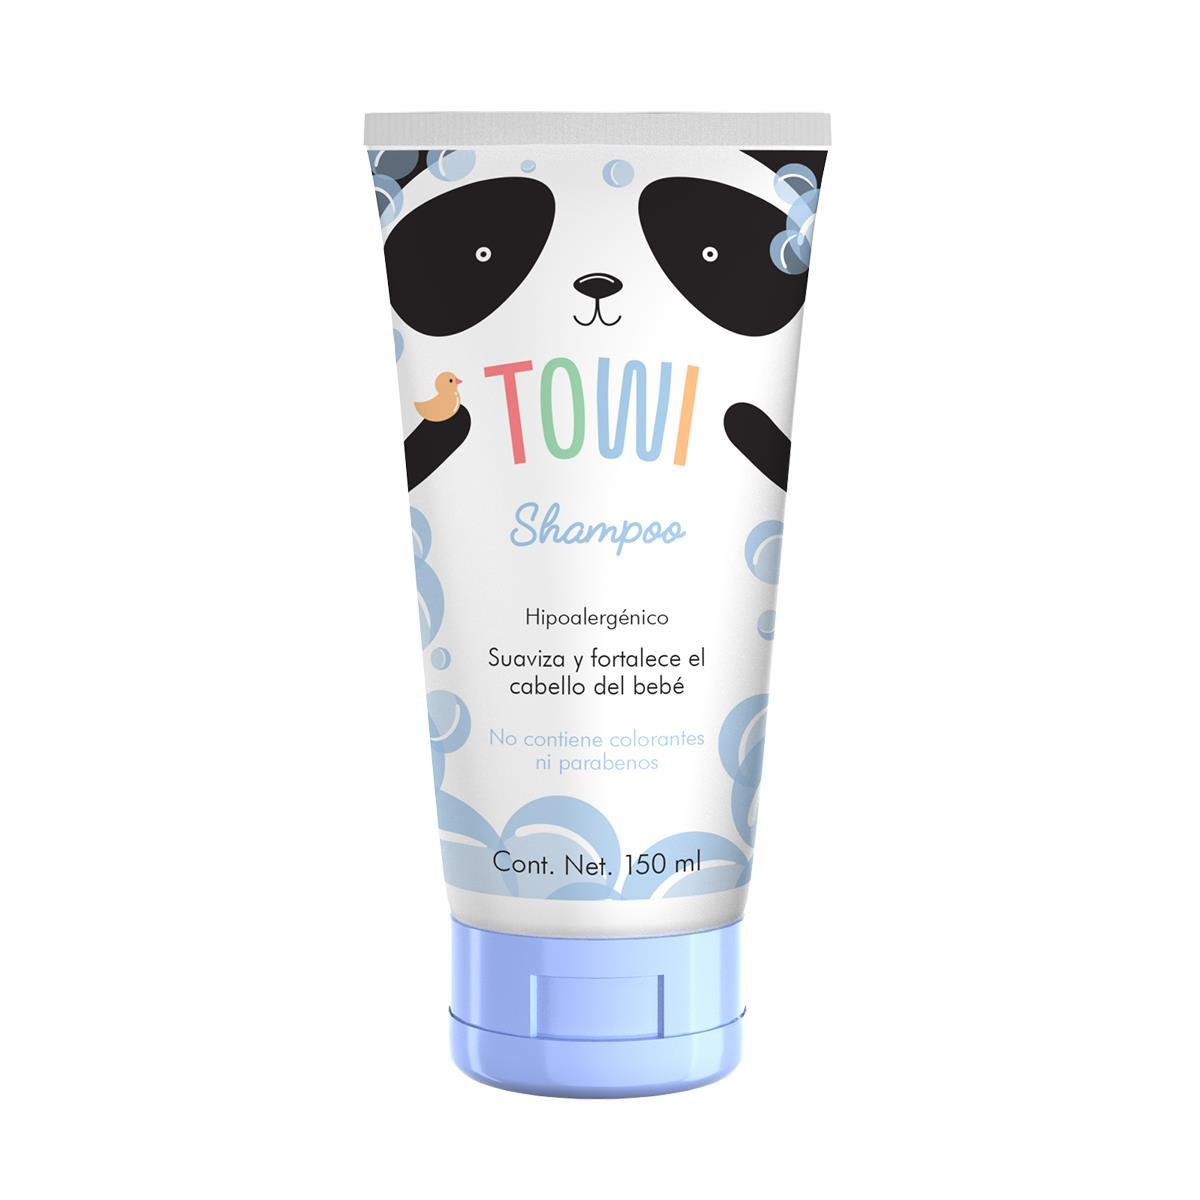 Towi Shampoo Hipoalergénico 150 Ml